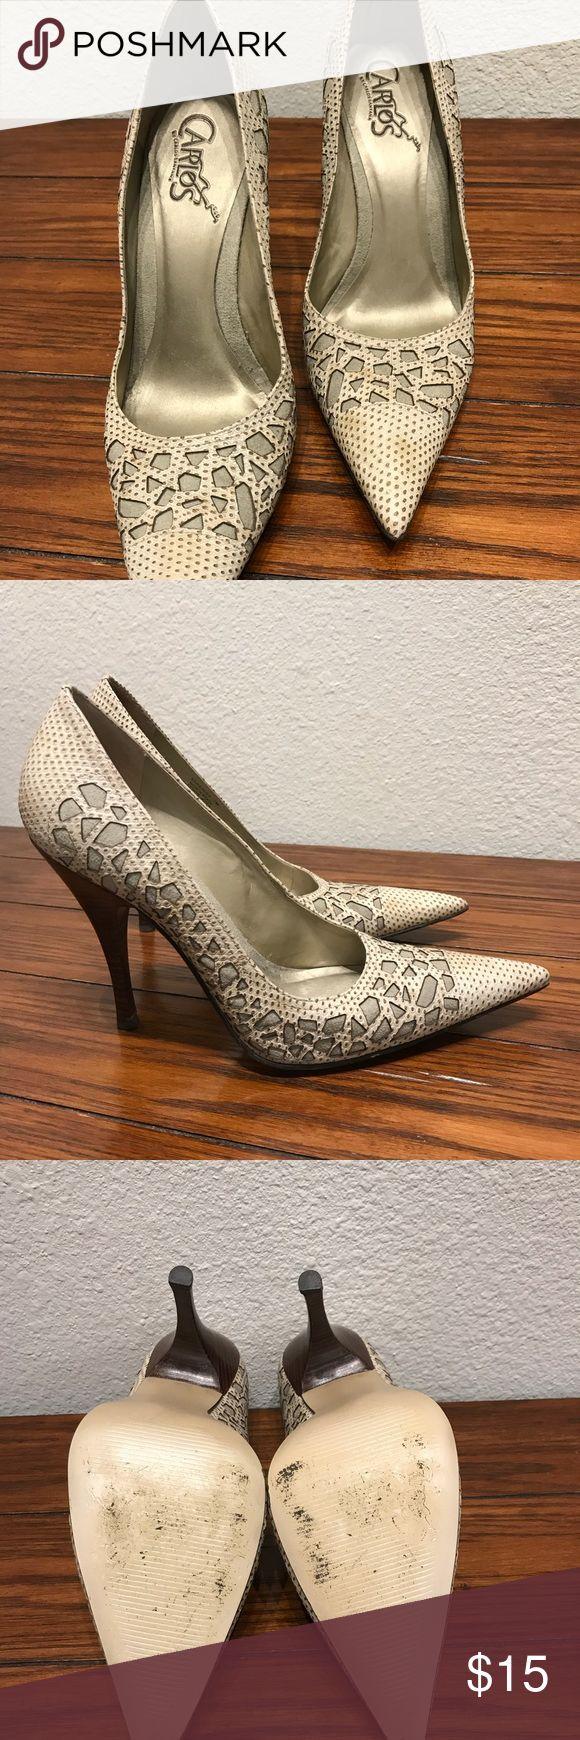 "Carlos Santana heels Used, good condition Carlos Santana 4"" heel Carlos Santana Shoes Heels"